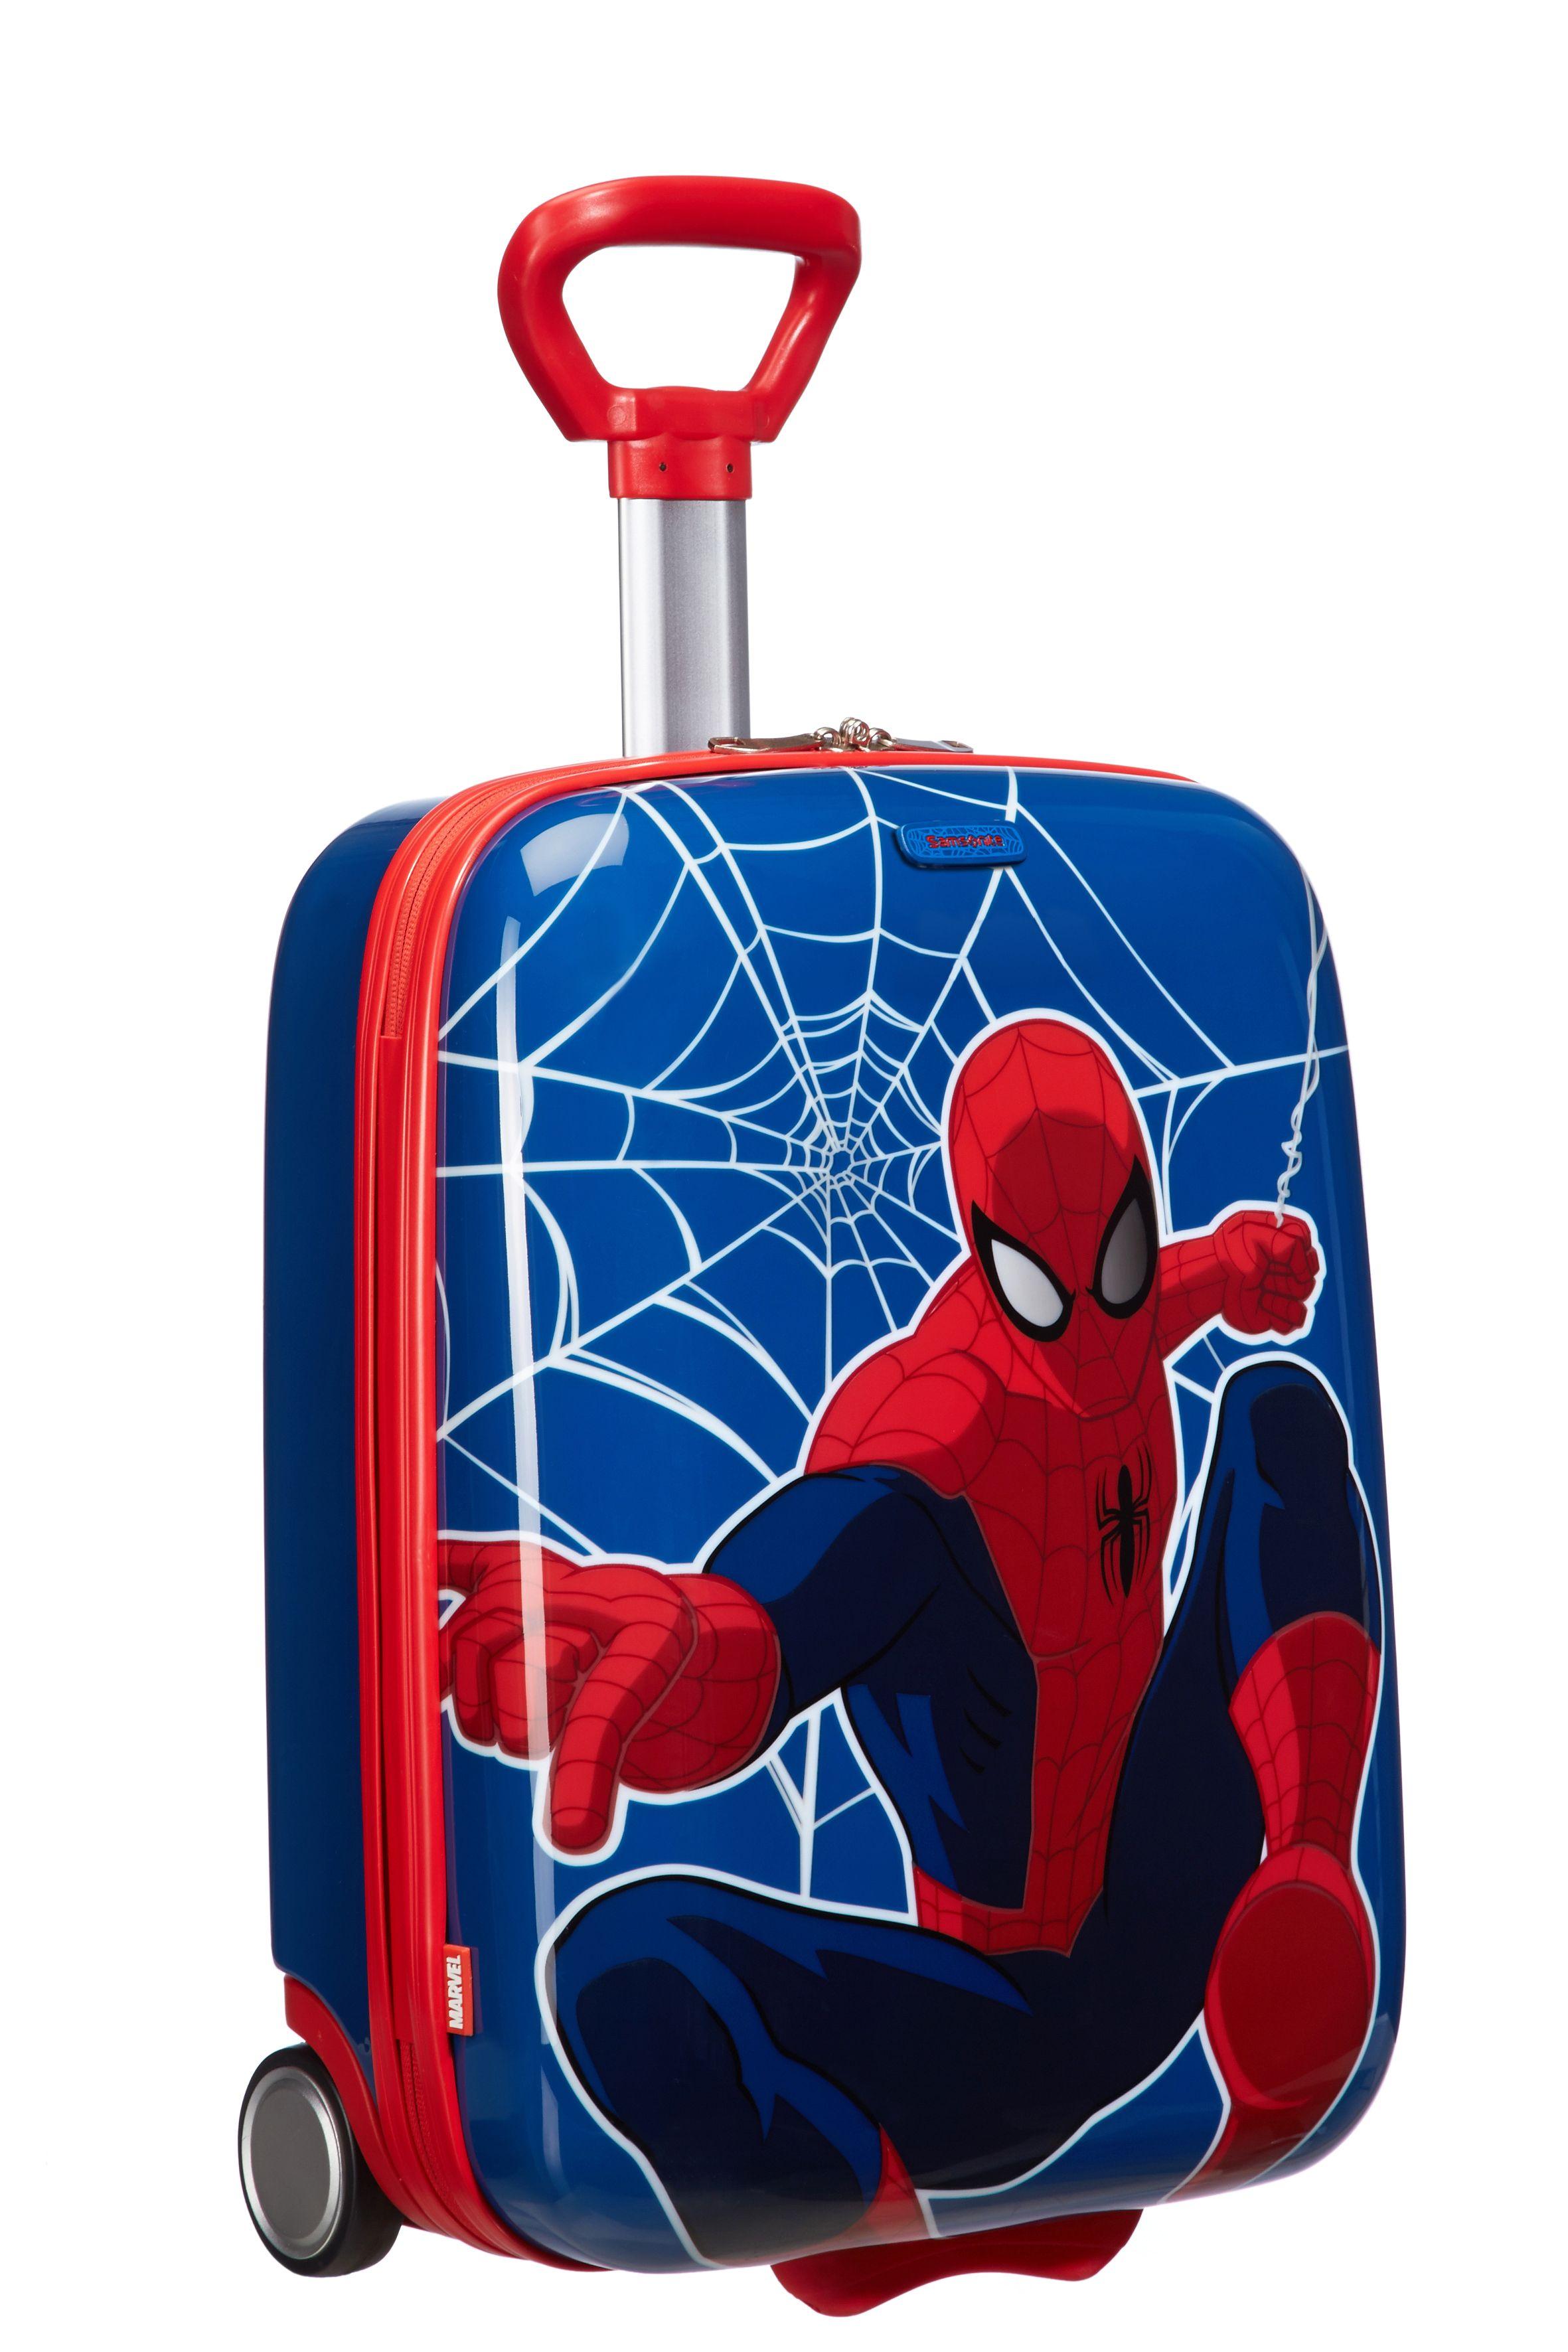 2db7a5280 Marvel Wonder - Spider-Man Hard Upright #Disney #Samsonite #Marvel # SpiderMan #Travel #Kids #School #Schoolbag #MySamsonite #ByYourSide